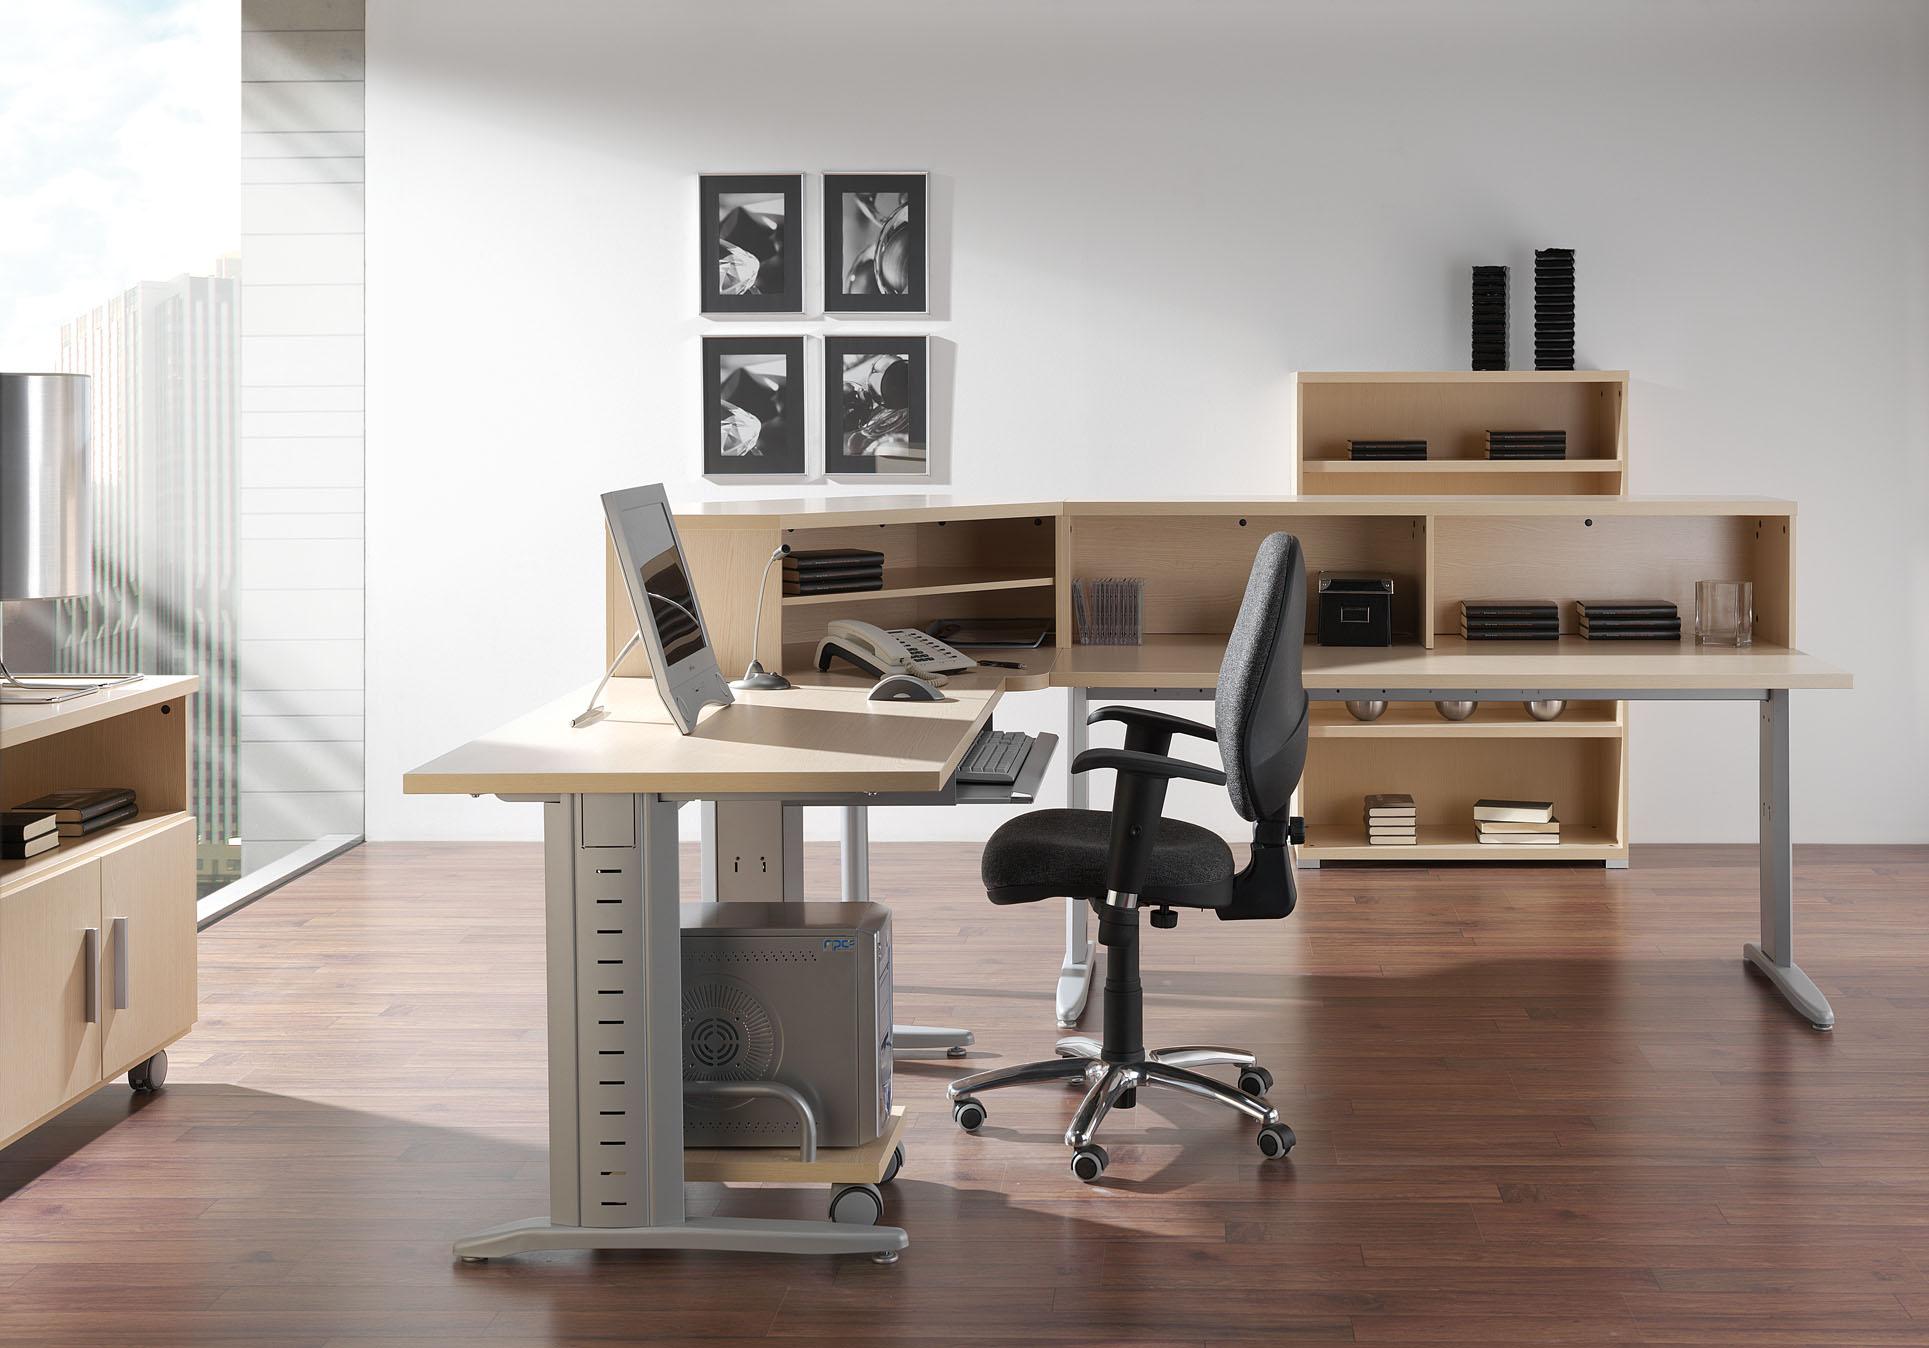 La evoluci n de los muebles de oficina muebles orts blog for Muebles la oficina